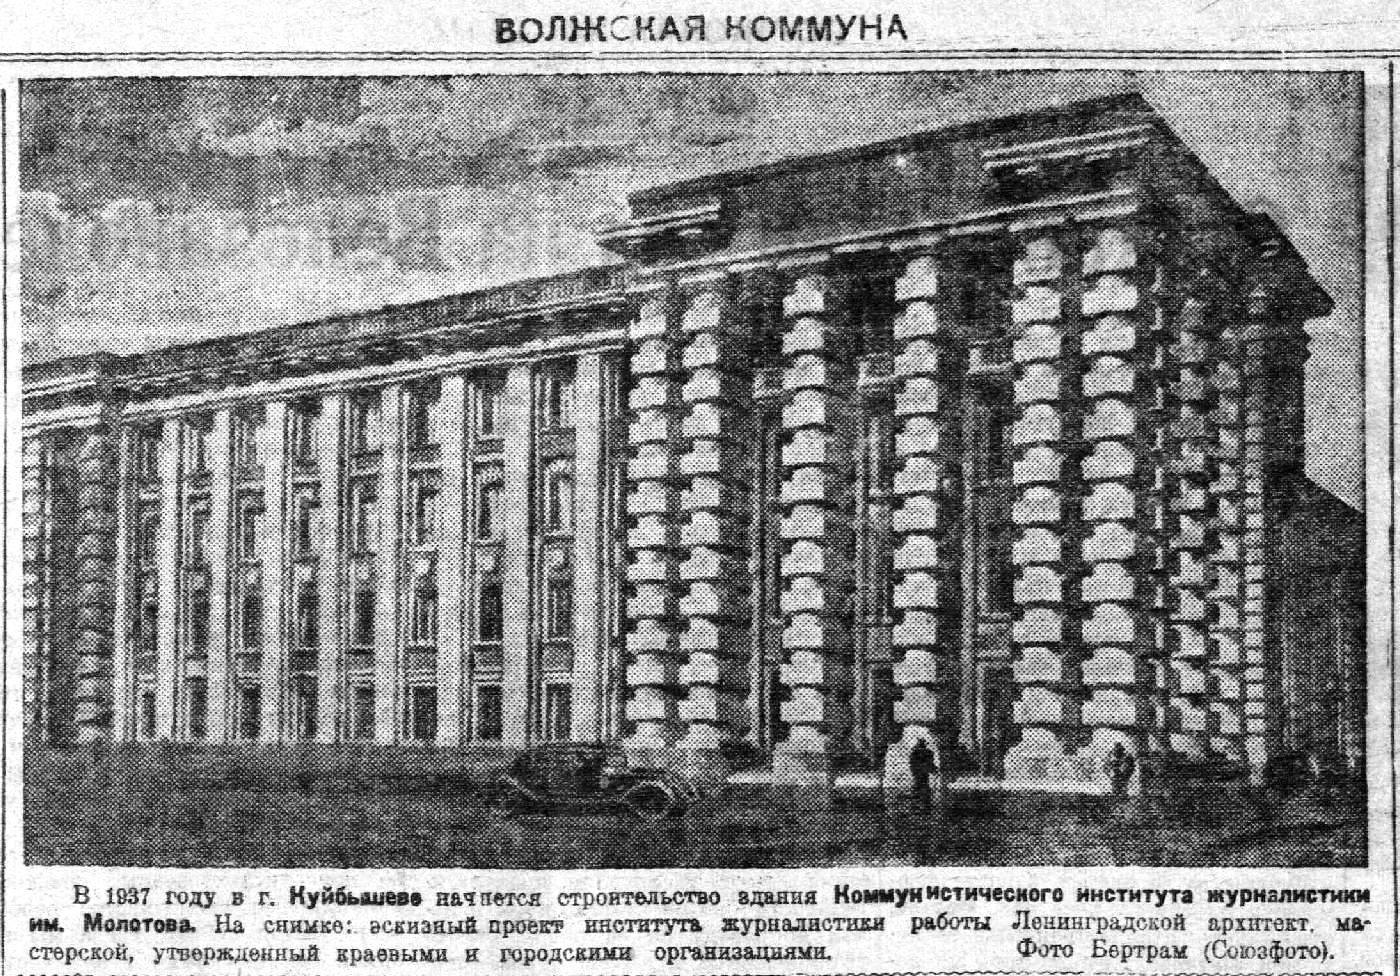 Куйбышевский институт журналистики